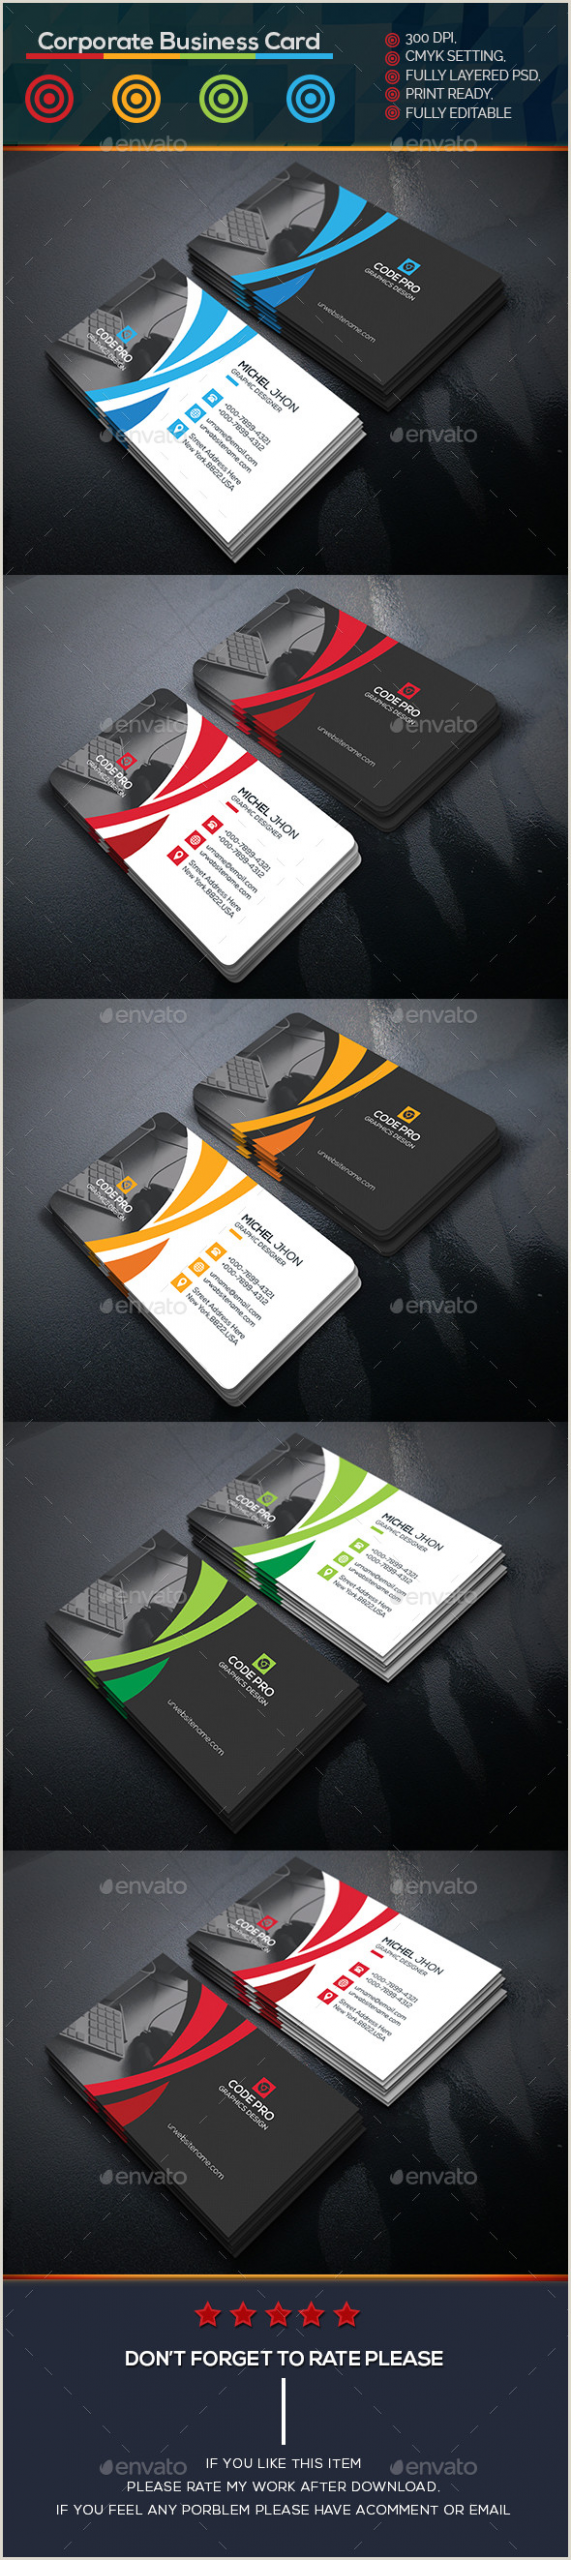 Business Card Design Pinterest Corporate Business Card Template Psd …